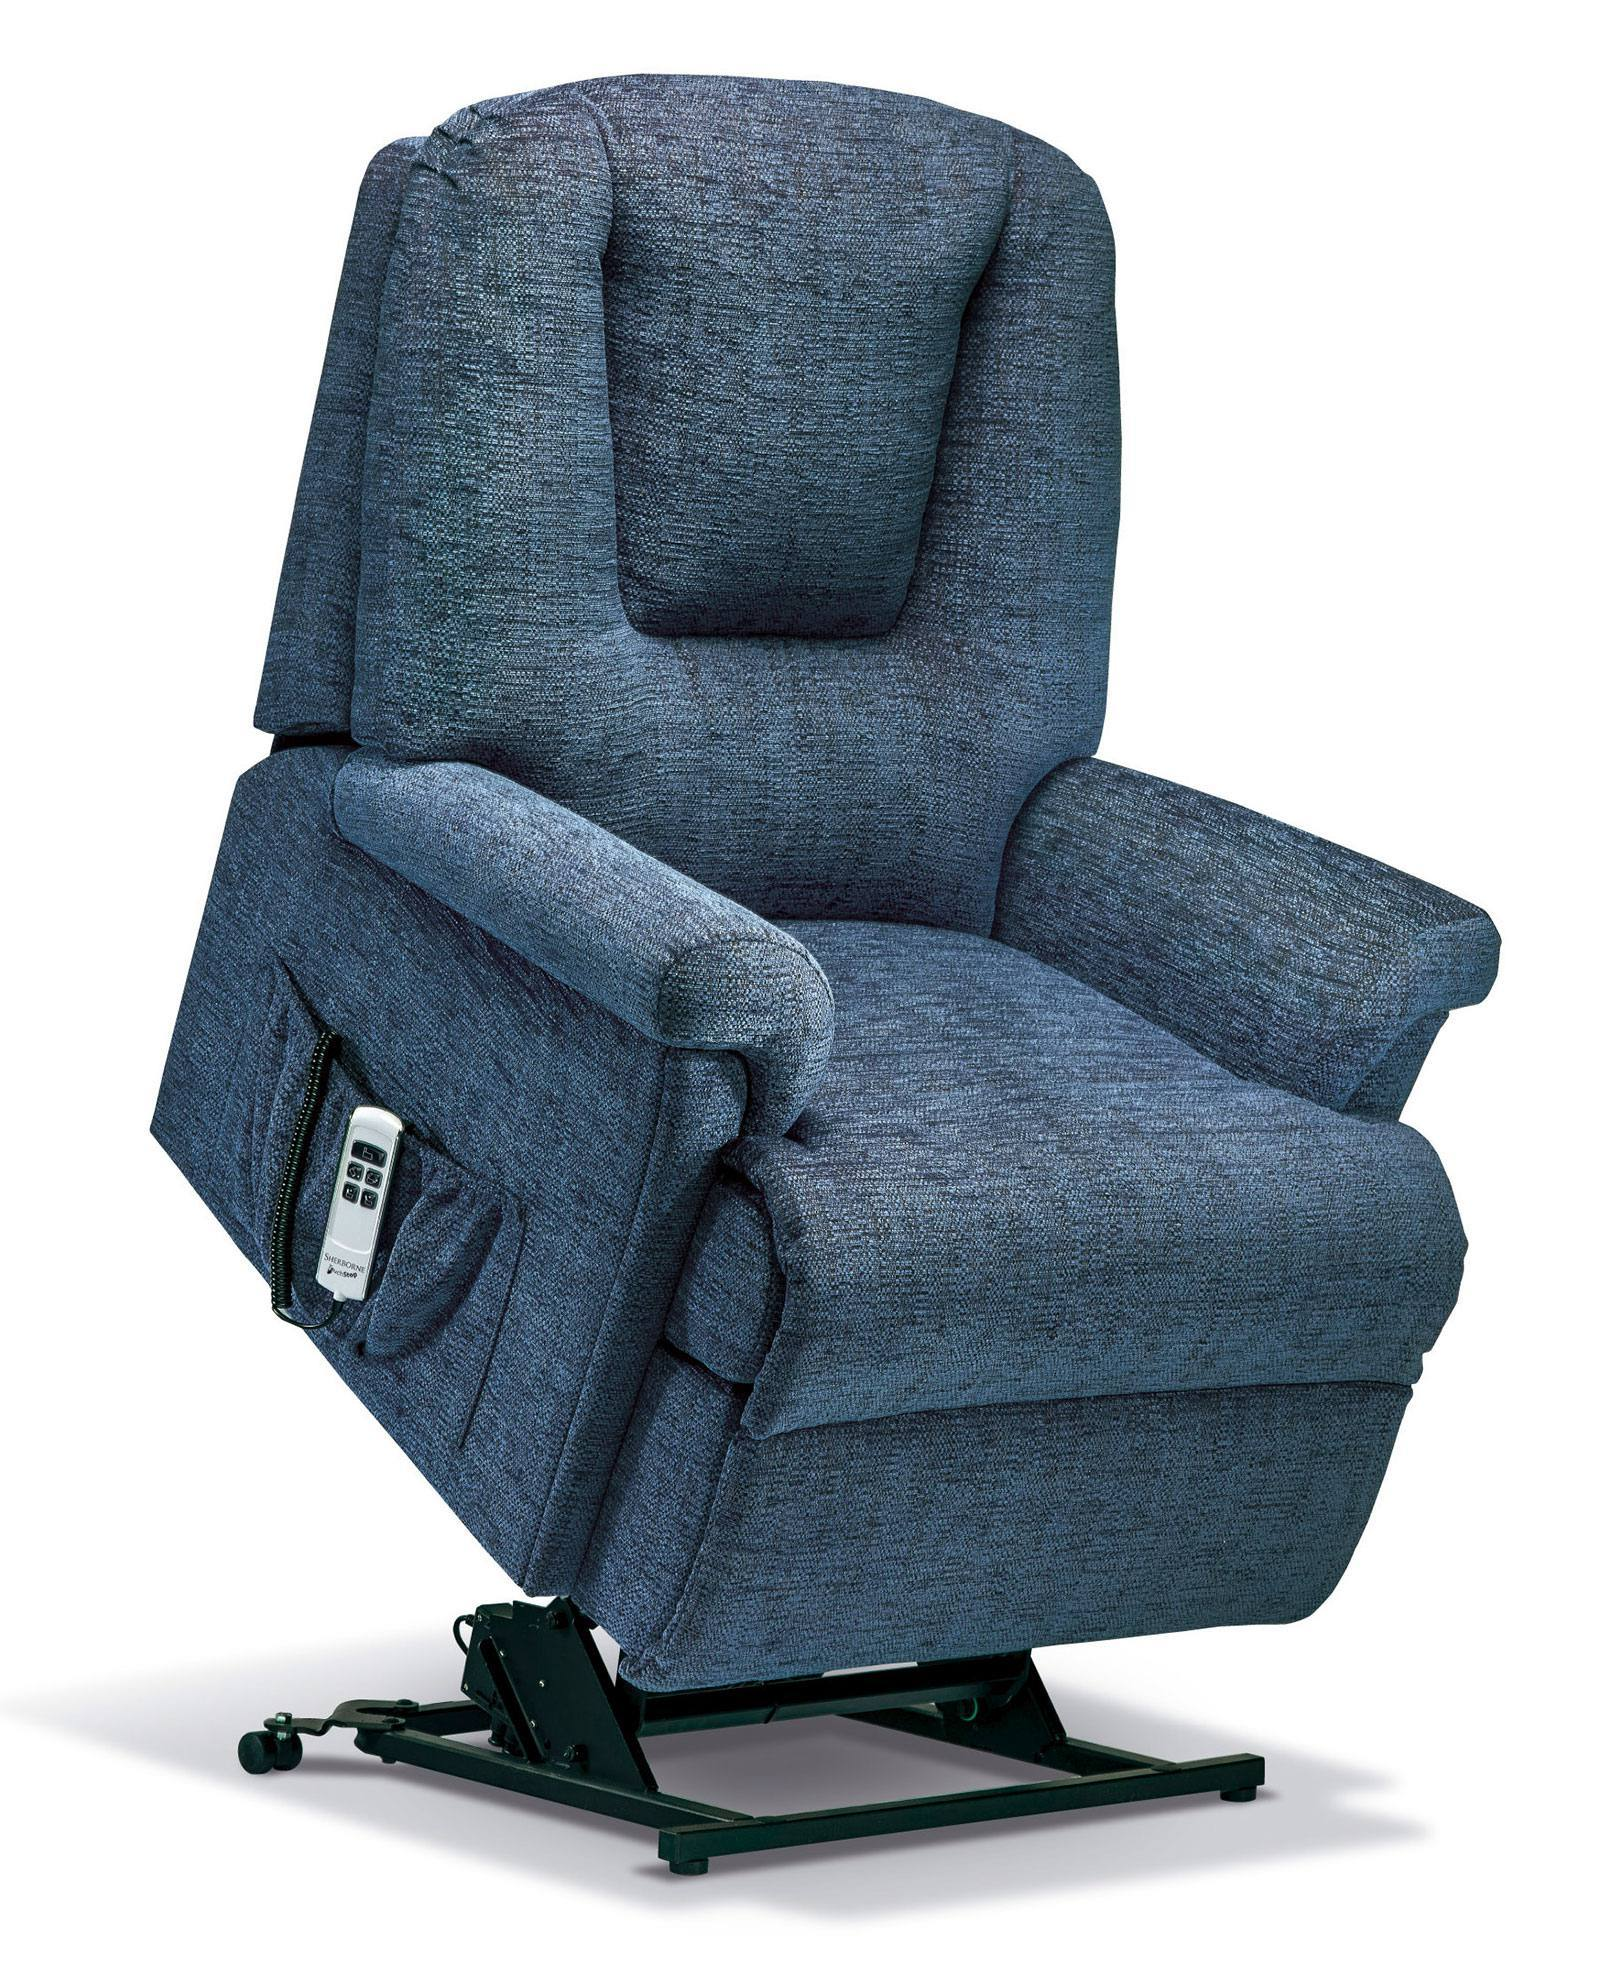 Sherborne Milburn Royale Electric Riser Recliner Chair